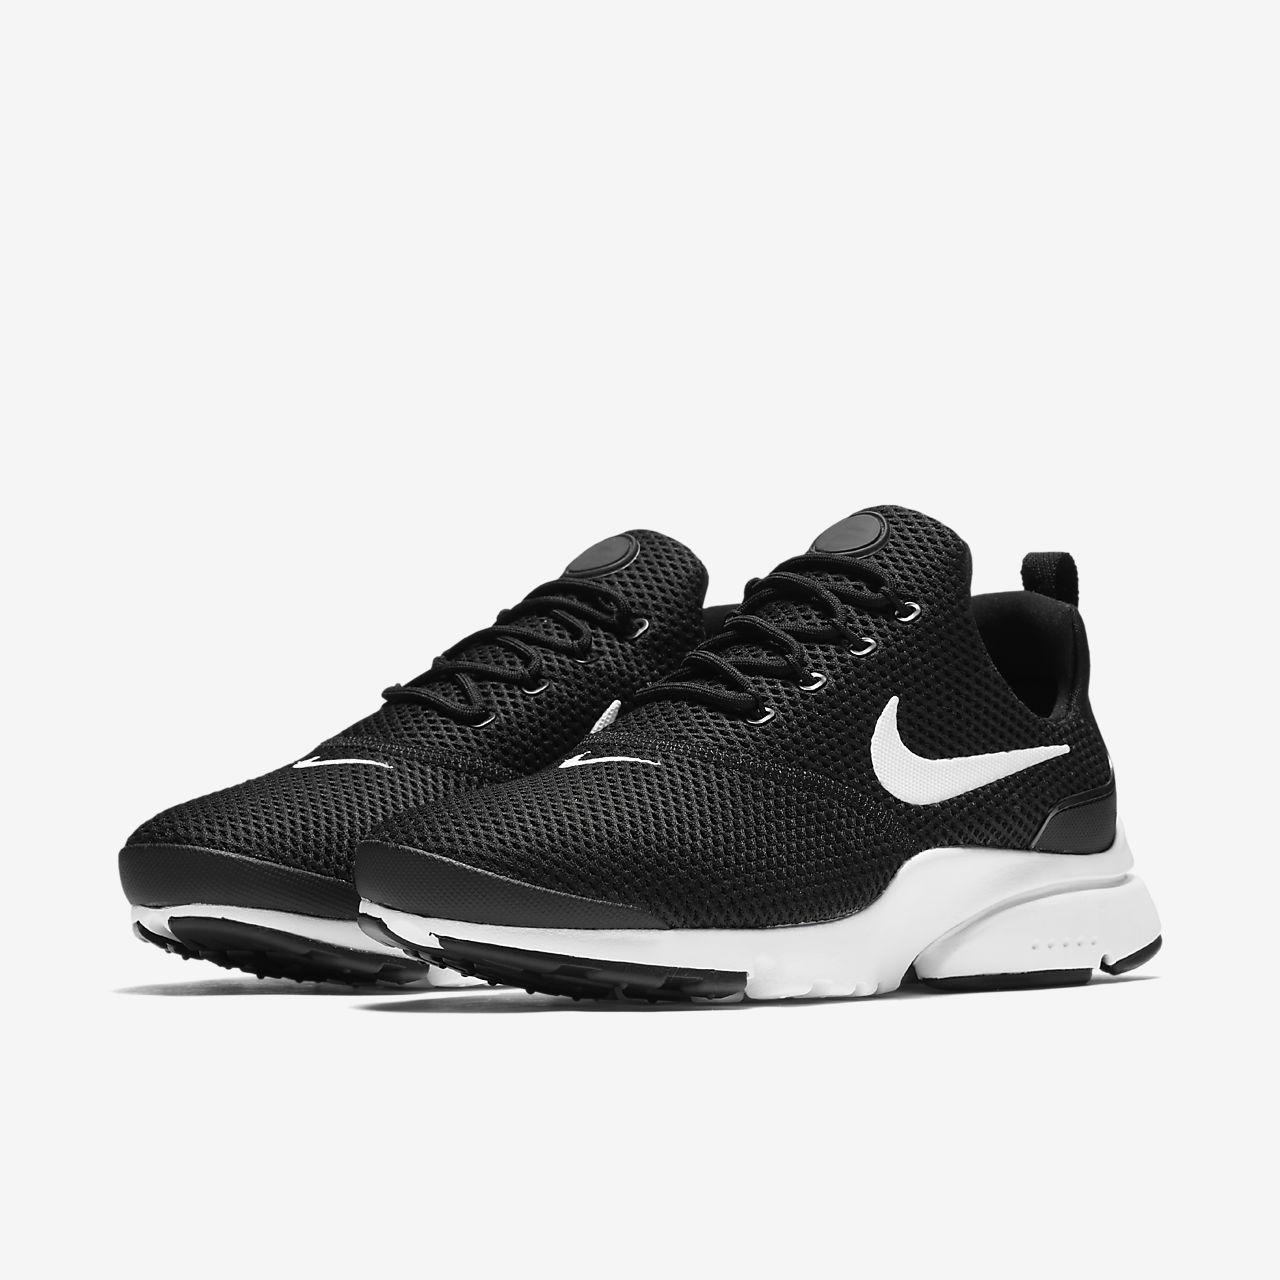 sale retailer db93b c8c96 ... info for bfdb6 0b7f7 ... Nike Presto Fly Womens Shoe